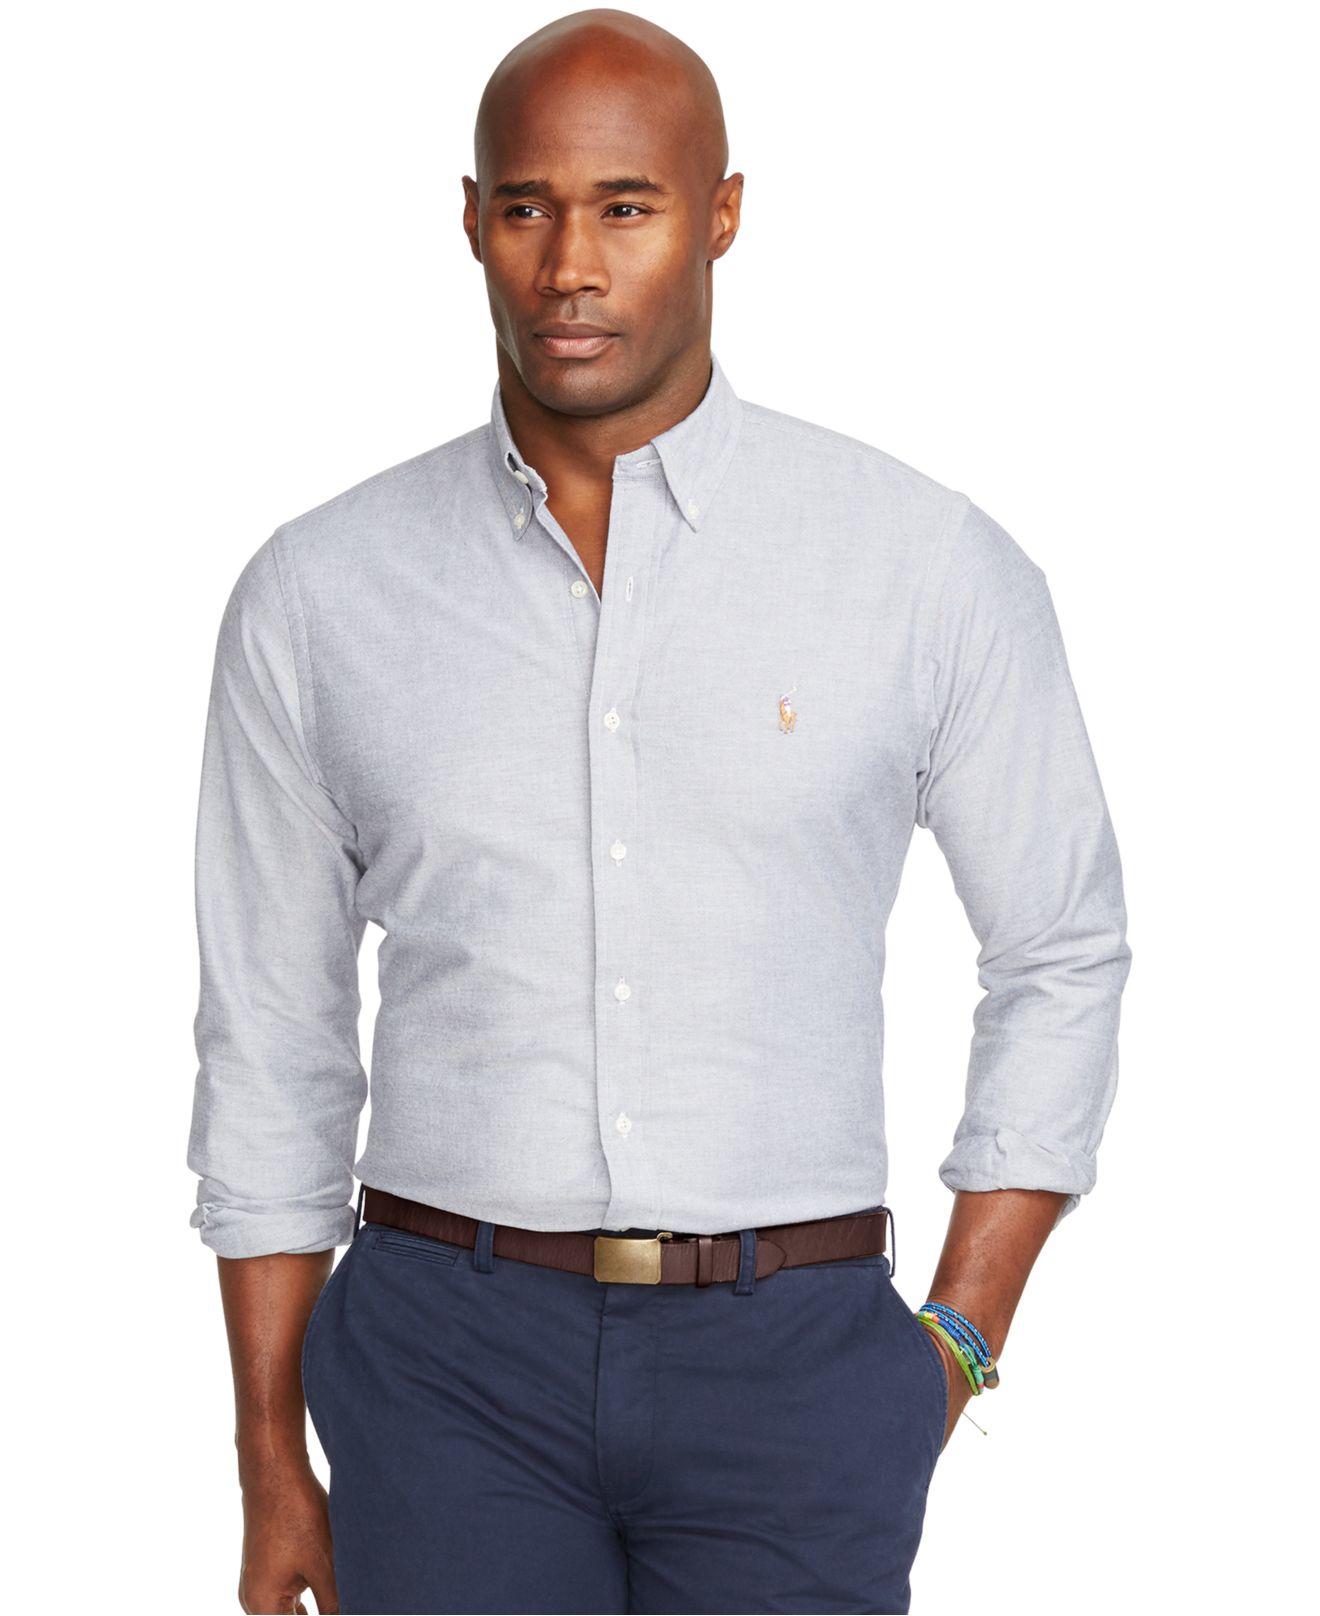 Polo ralph lauren men 39 s big and tall gingham oxford shirt for Big and tall oxford shirts